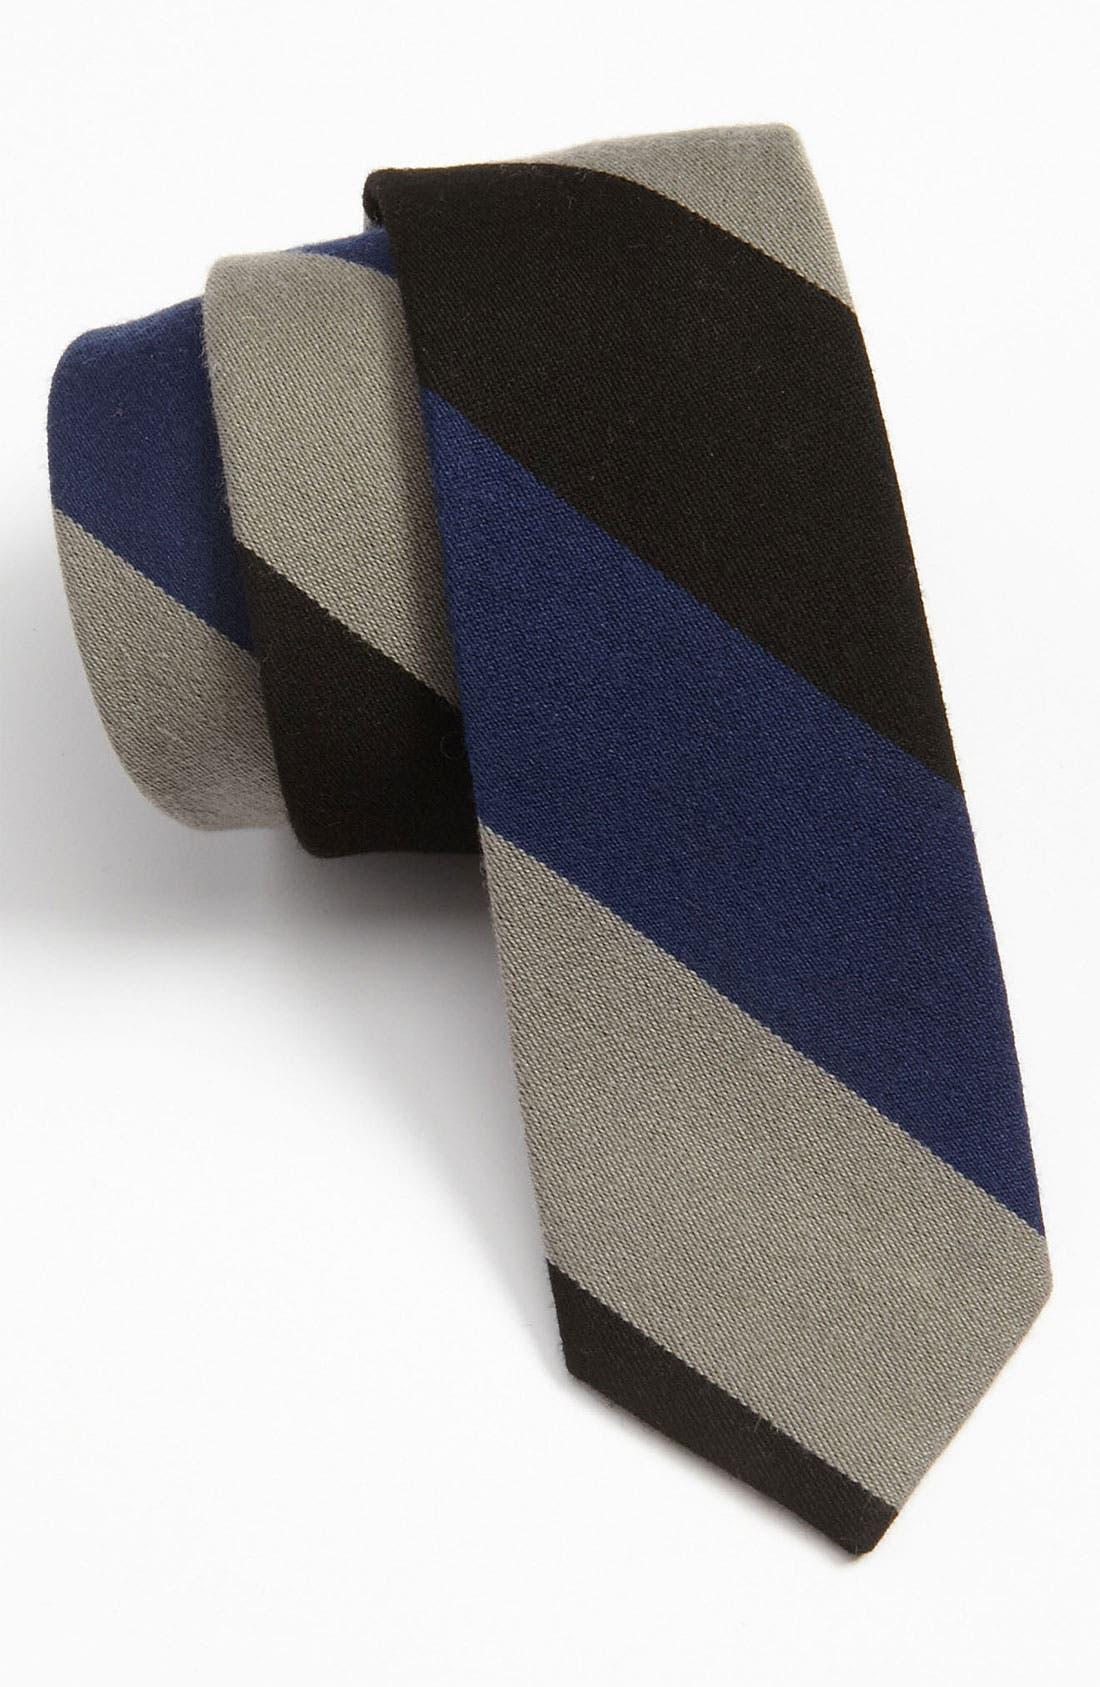 Main Image - The Tie Bar Woven Tie